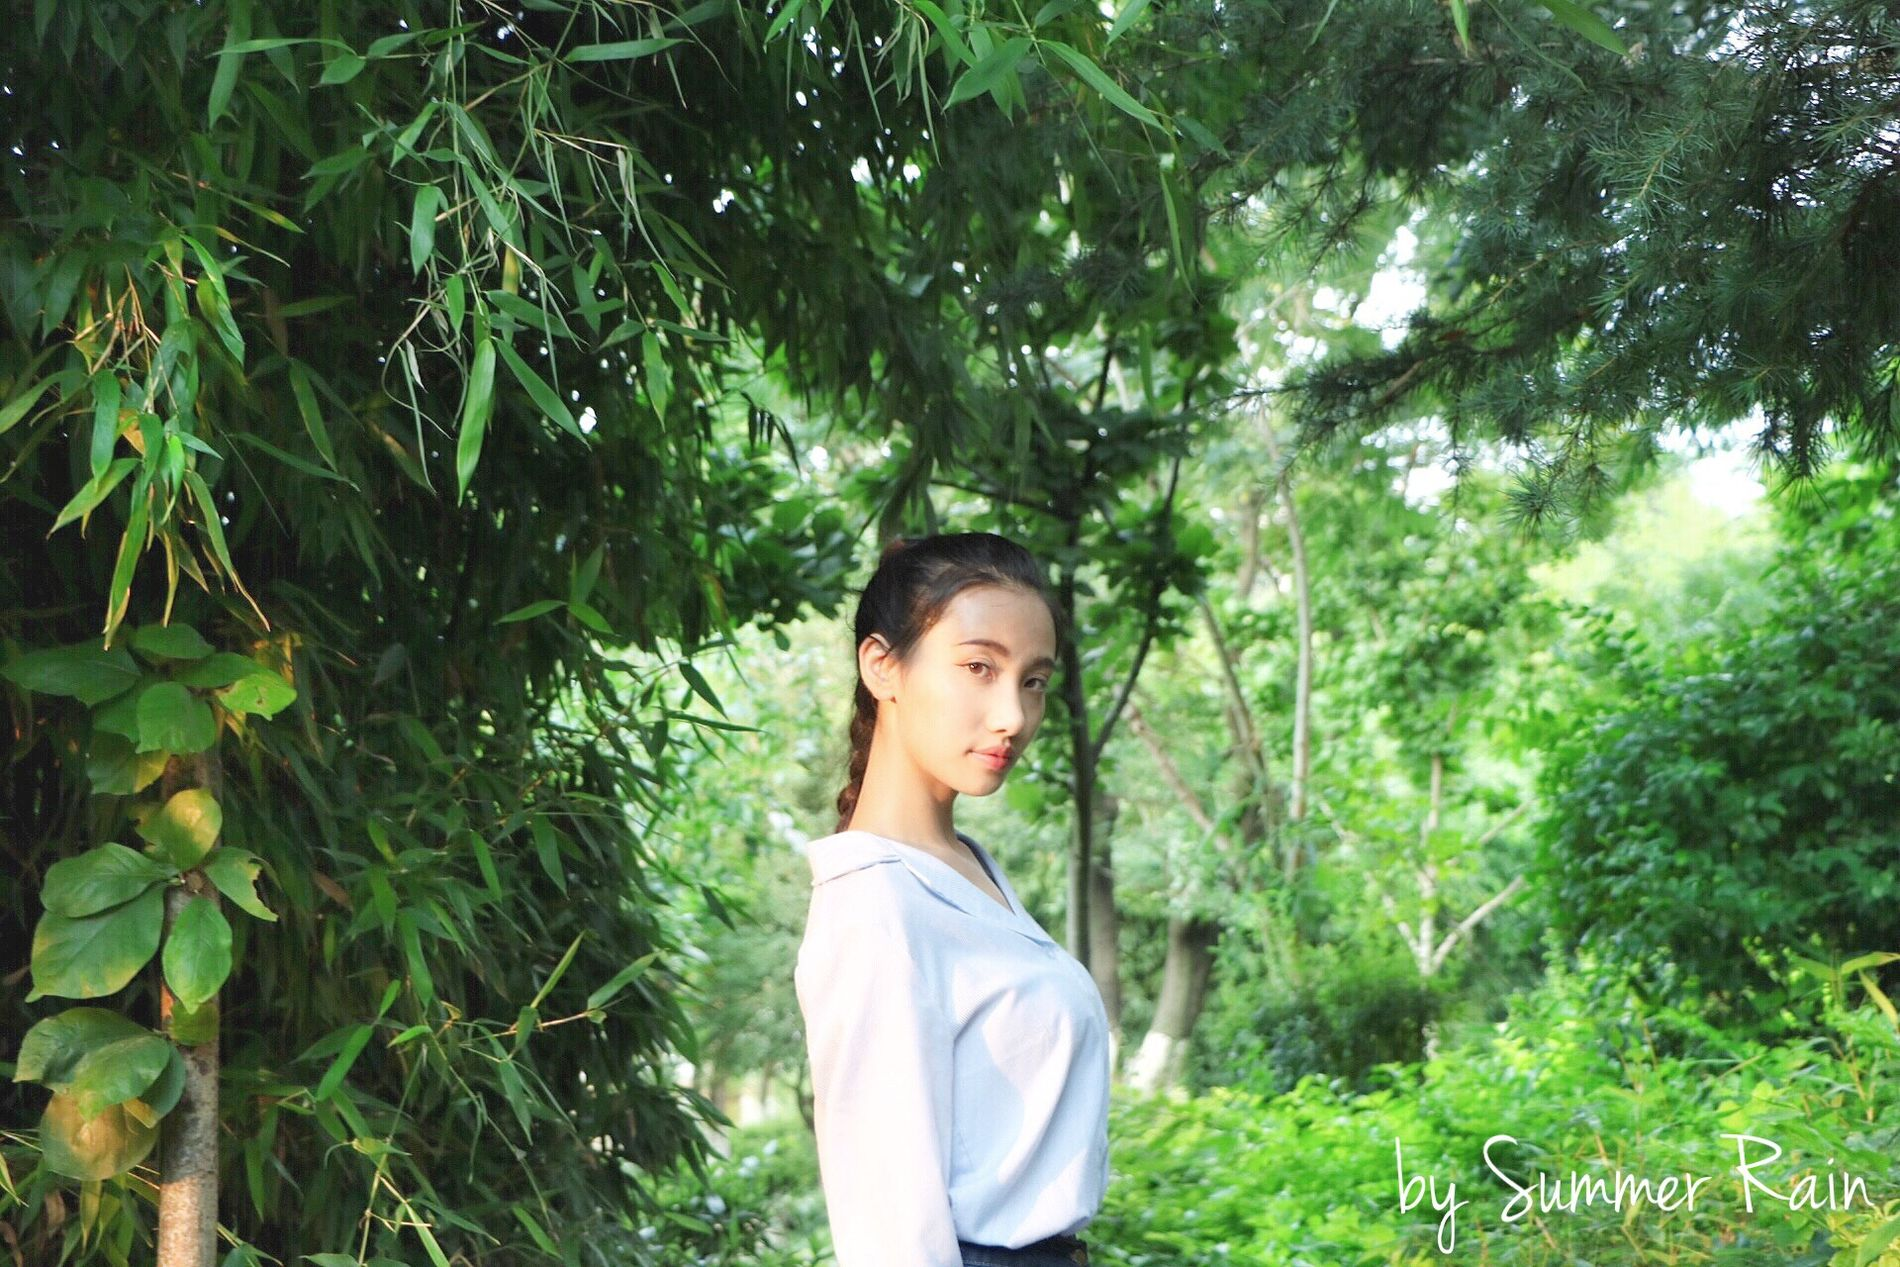 Summer.with sister in the green day. Gree Summe Hello World Siste Cheese! Relaxing Taking Photos Enjoying Life Hi! Watching Tree Yunnan ,China Yunnan